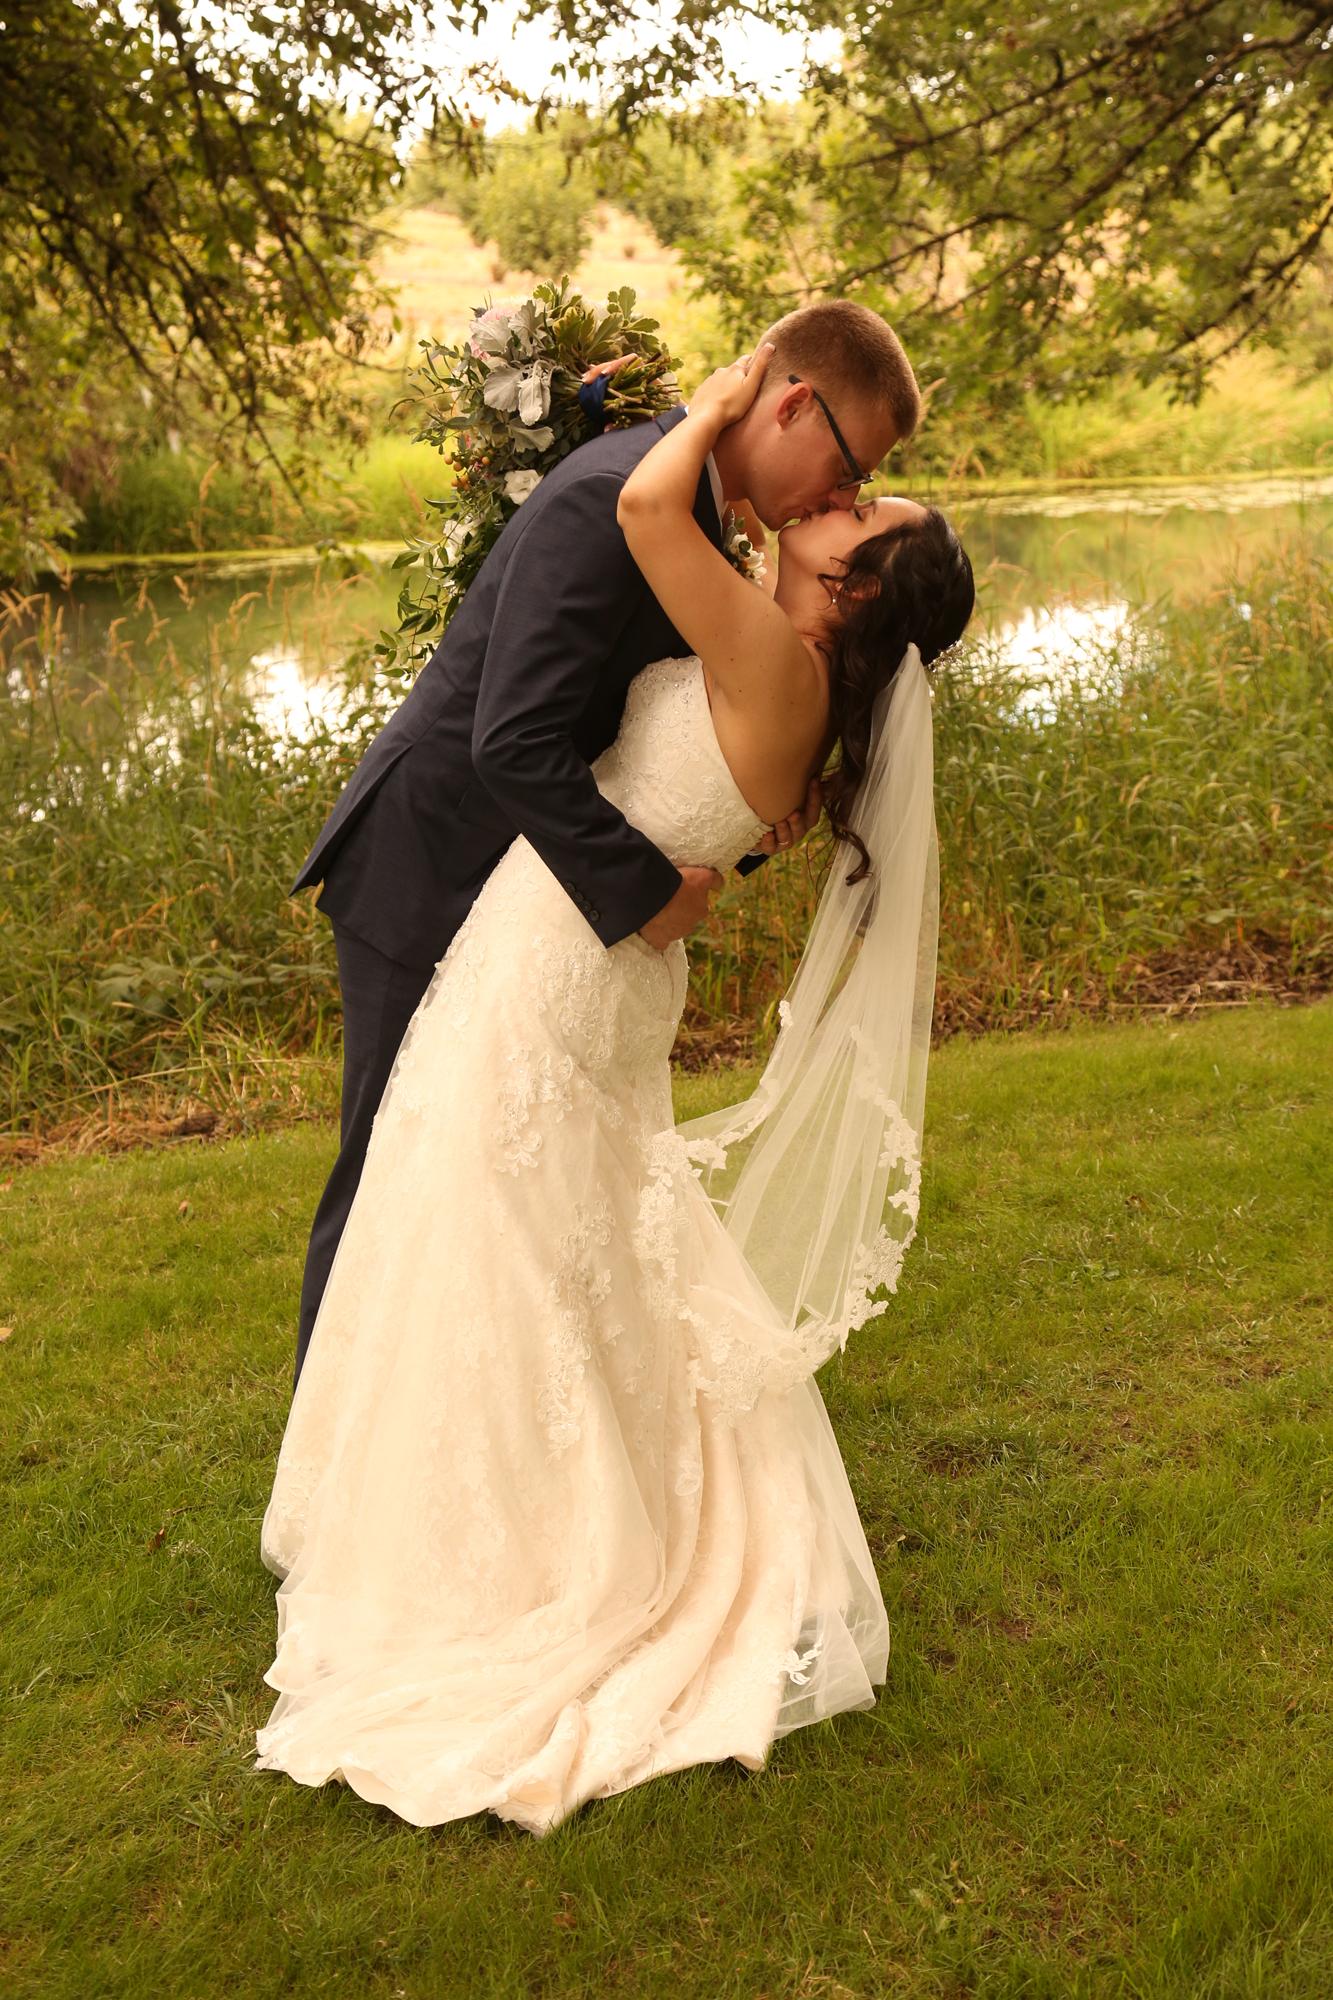 First Kiss weddings